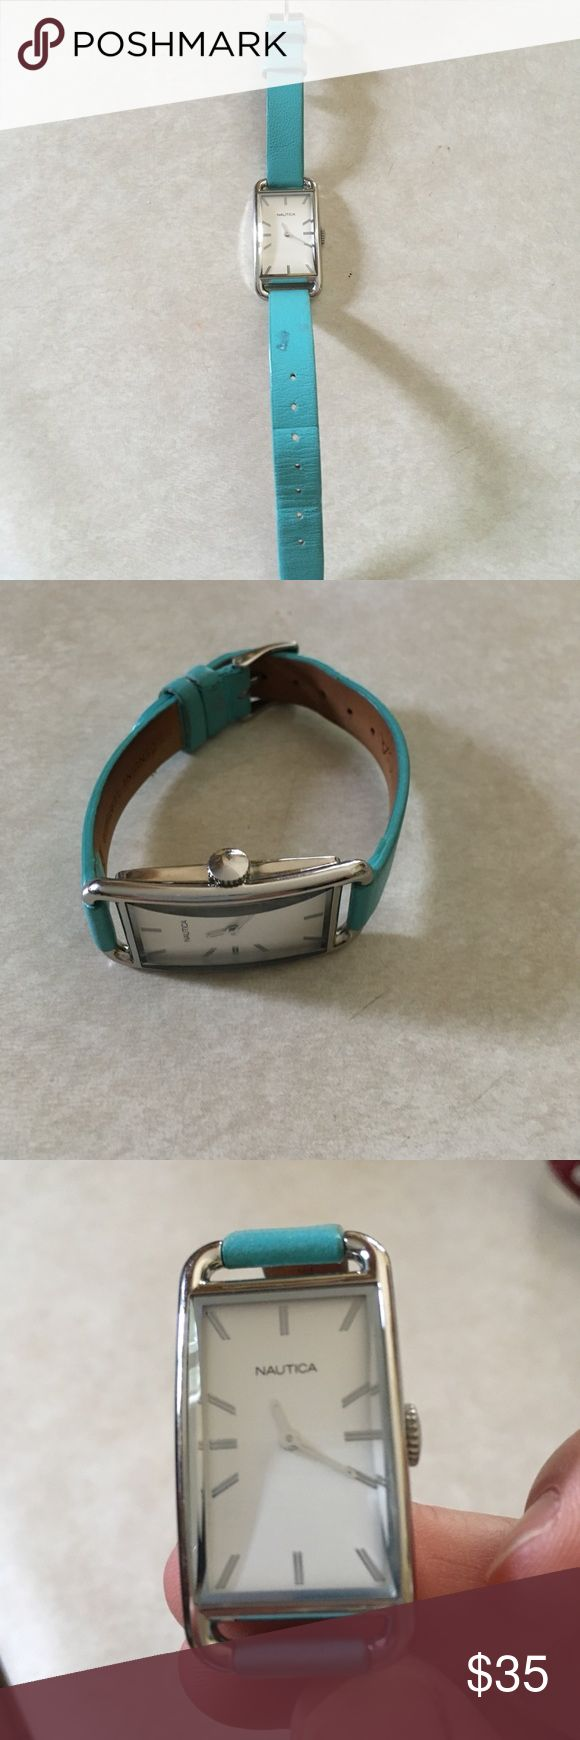 Women's watch Nautical women's watch. Leather band. Nautica Accessories Watches